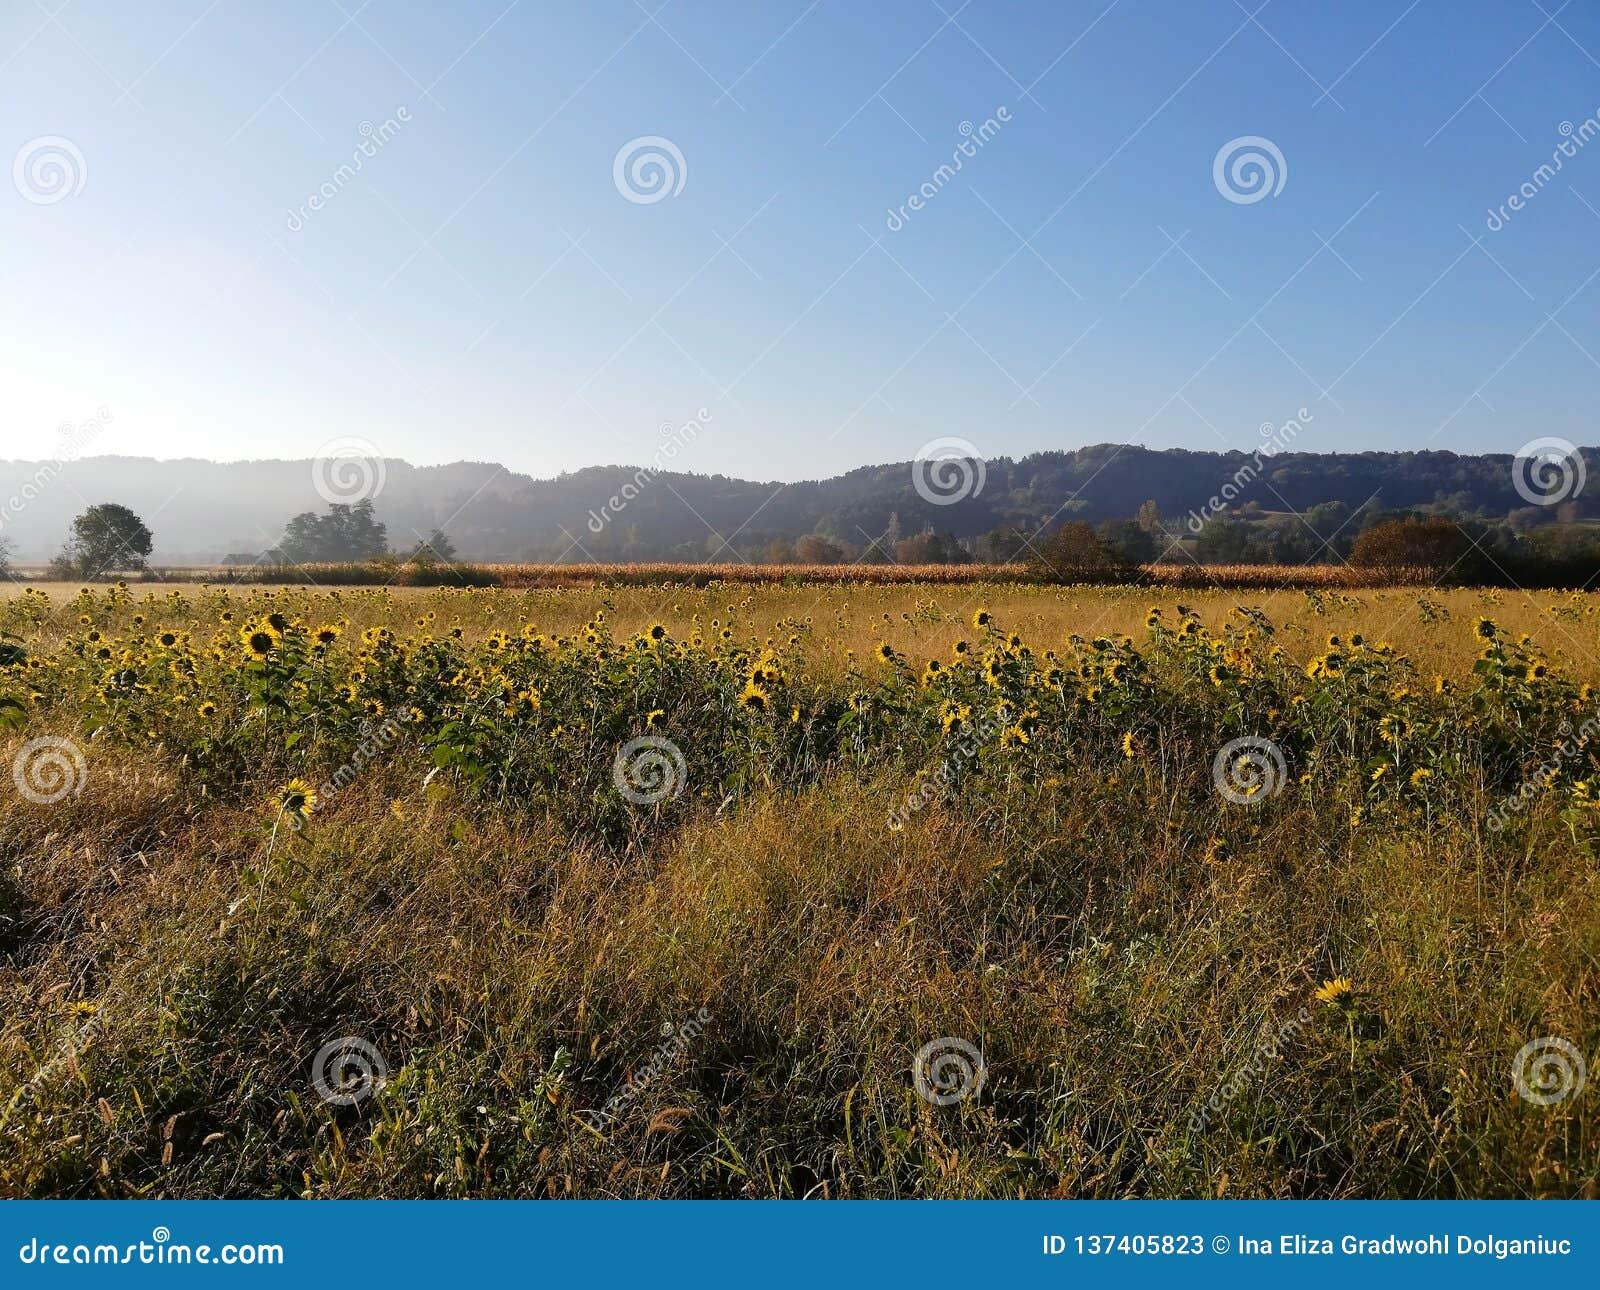 Sonnenblumenfeld in der Landschaft